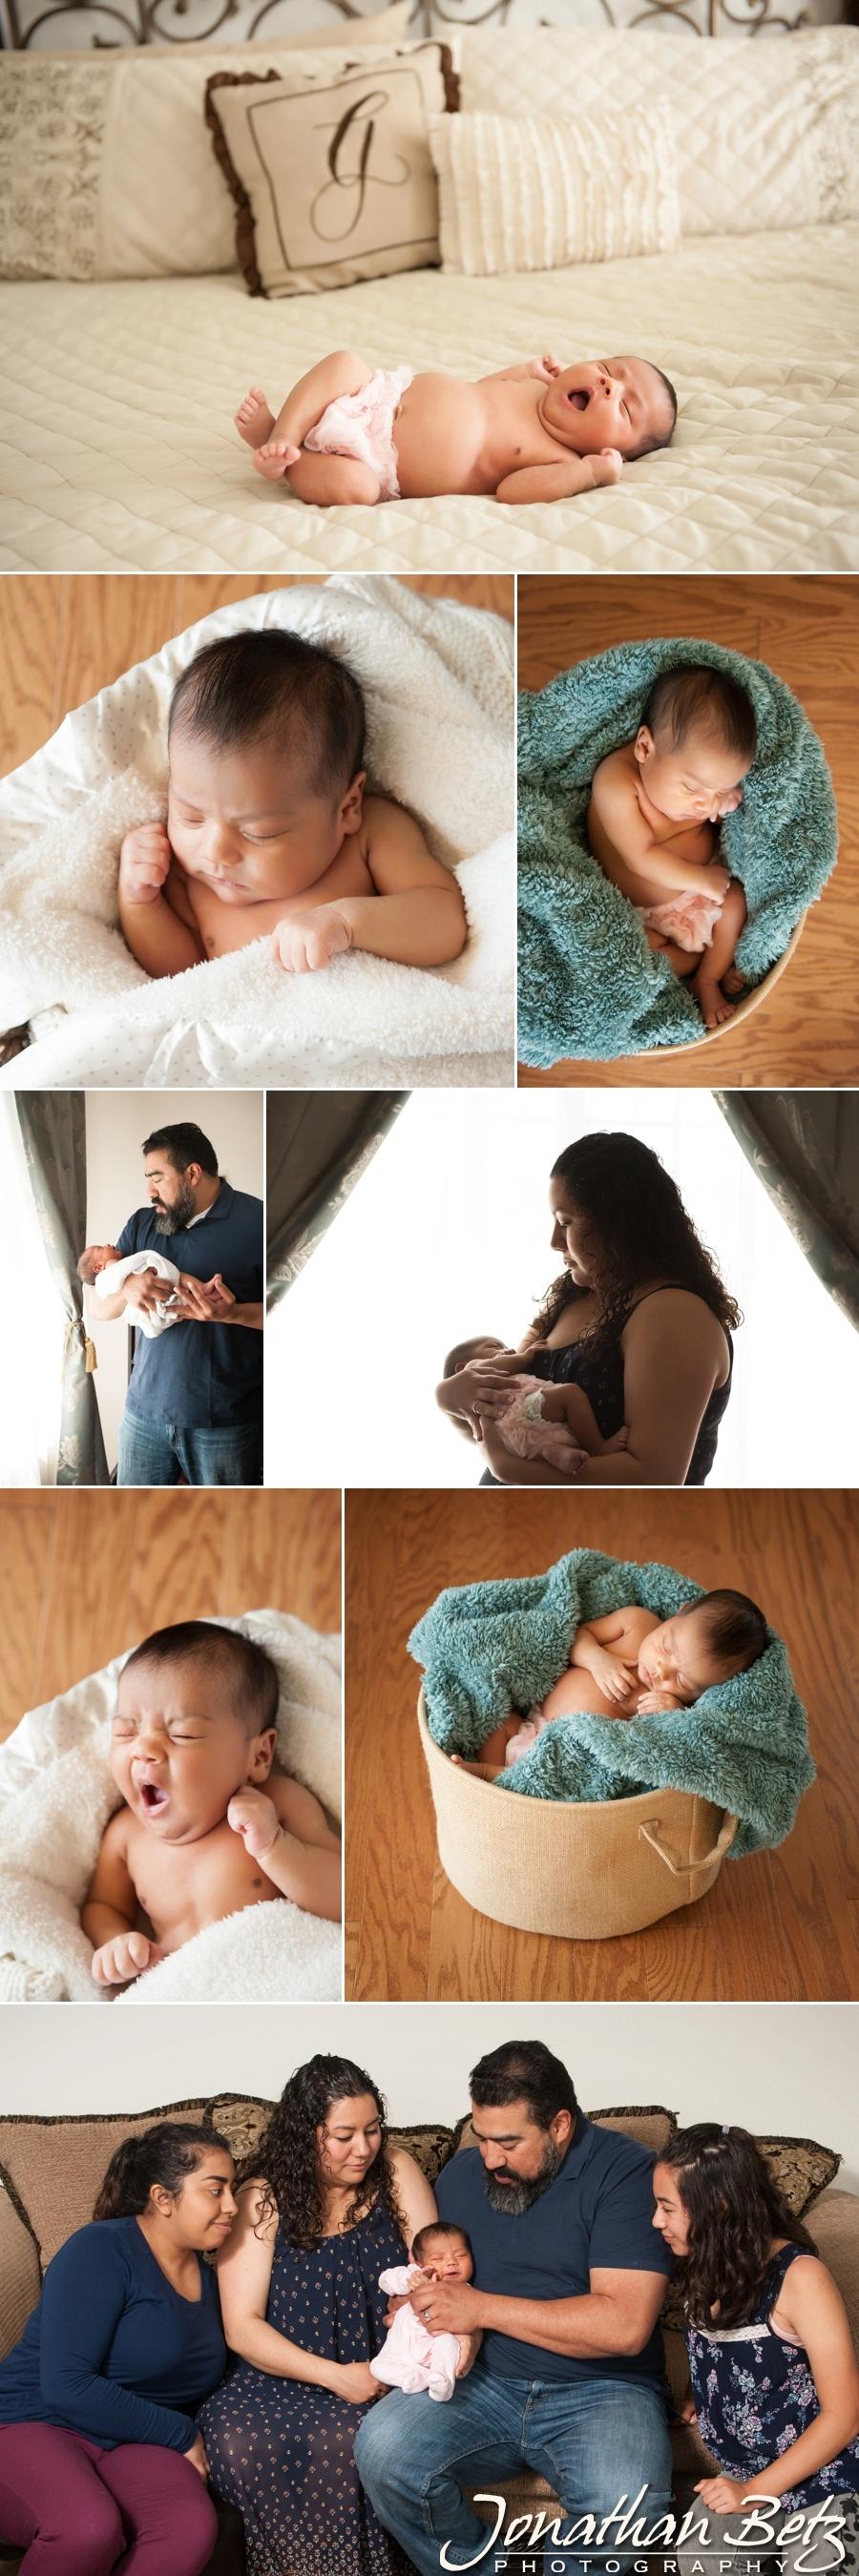 Colorado Springs Newborn Baby Photographer Jonathan Betz Photography 1